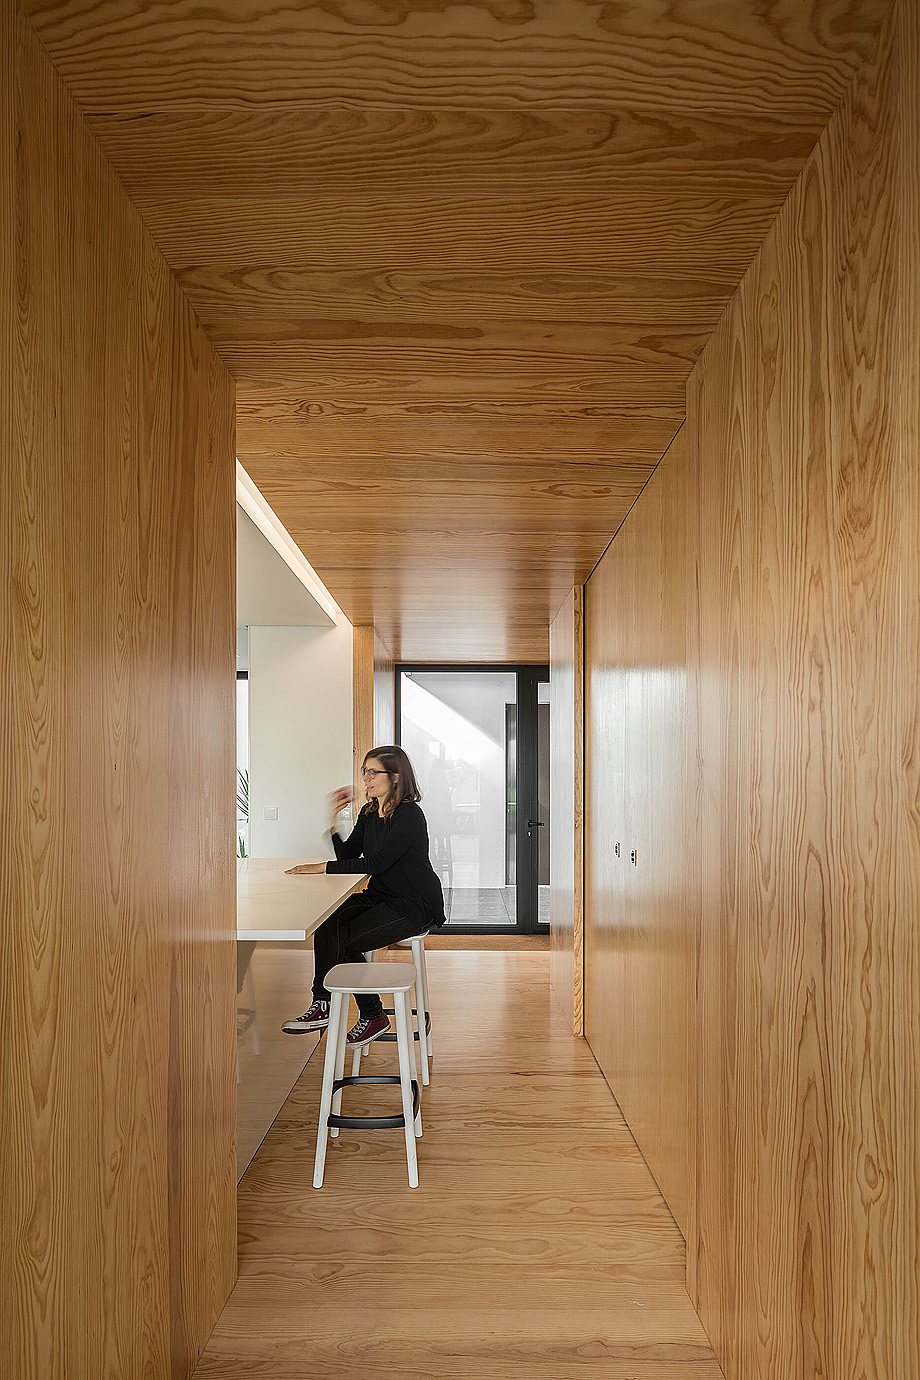 casa do arco de frari architecture network - foto ivo tavares (15)